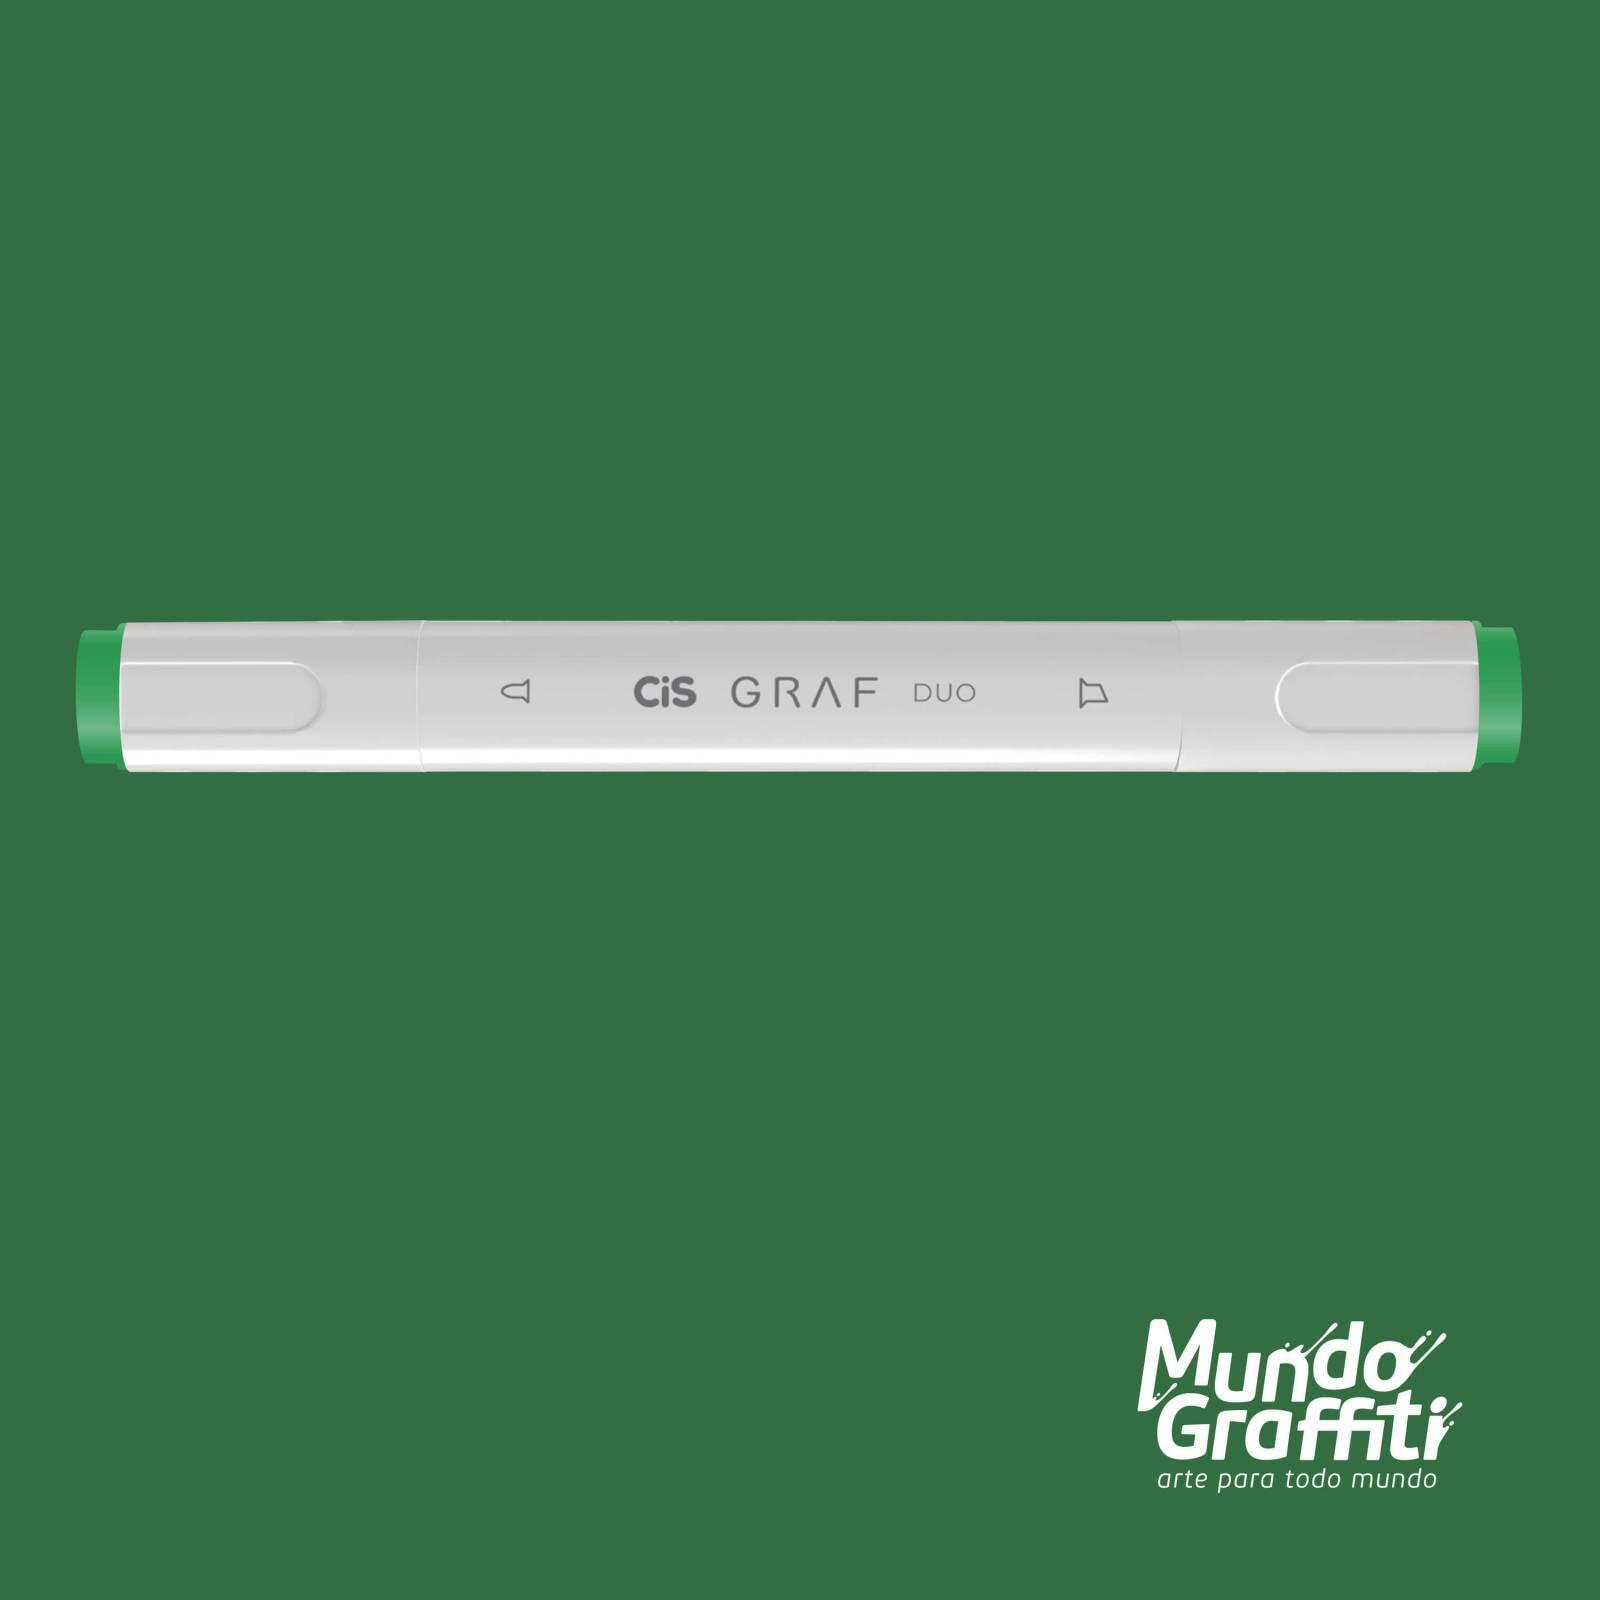 Marcador Cis Graf Duo Emerald Green 55 - Mundo Graffiti